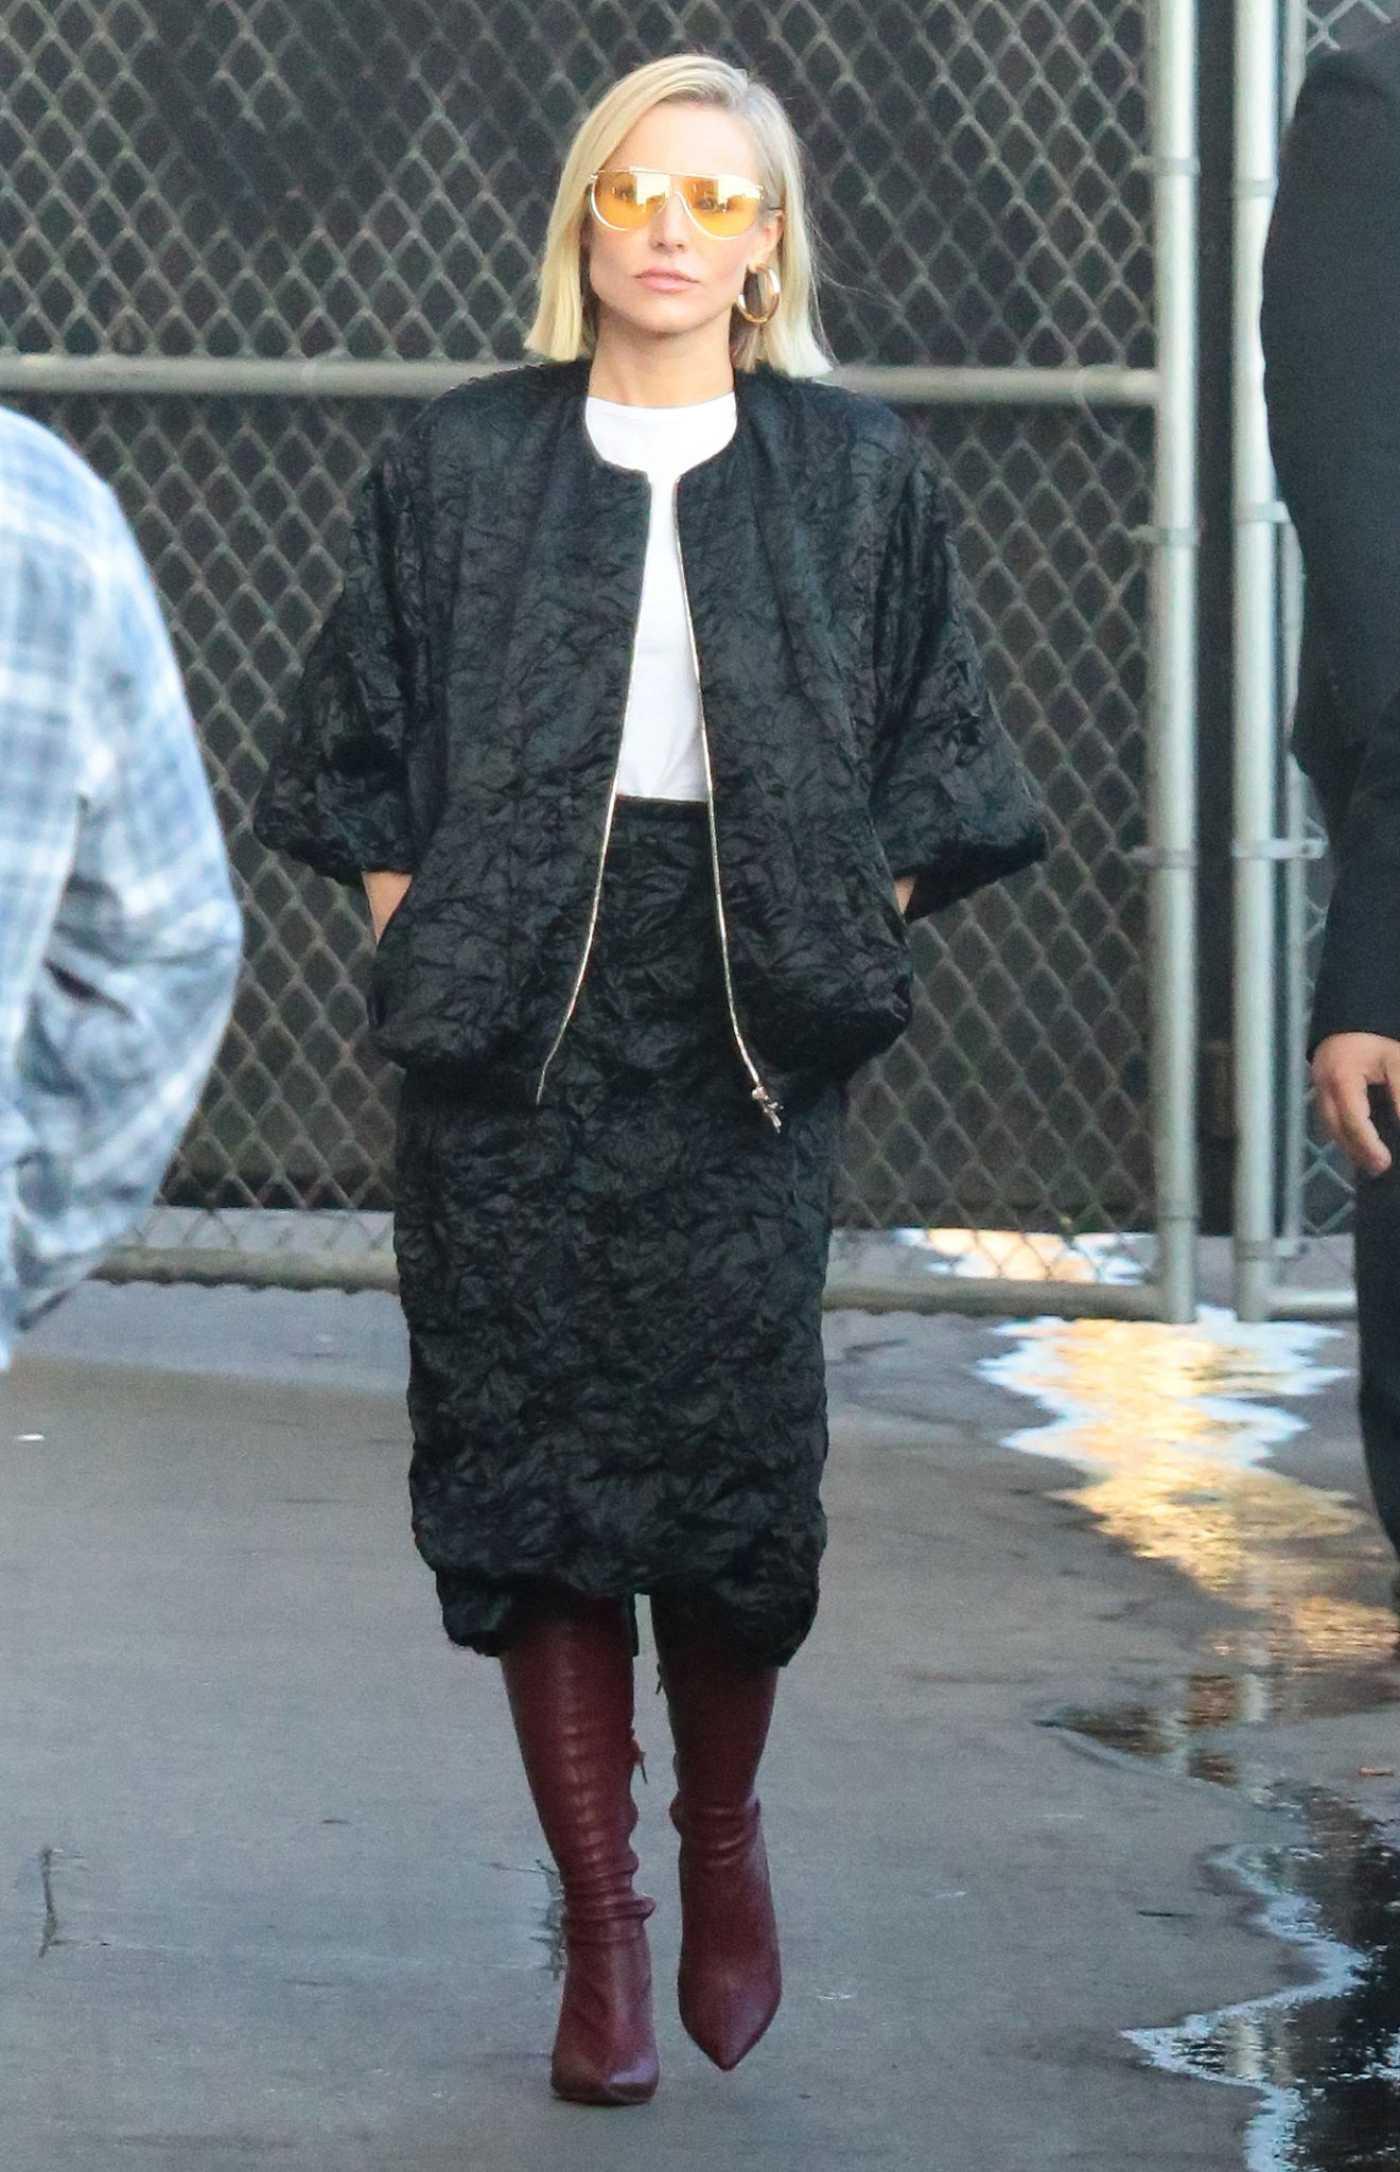 Kristen Bell in a Black Suit Arrives at Jimmy Kimmel Live in Los Angeles 11/07/2019